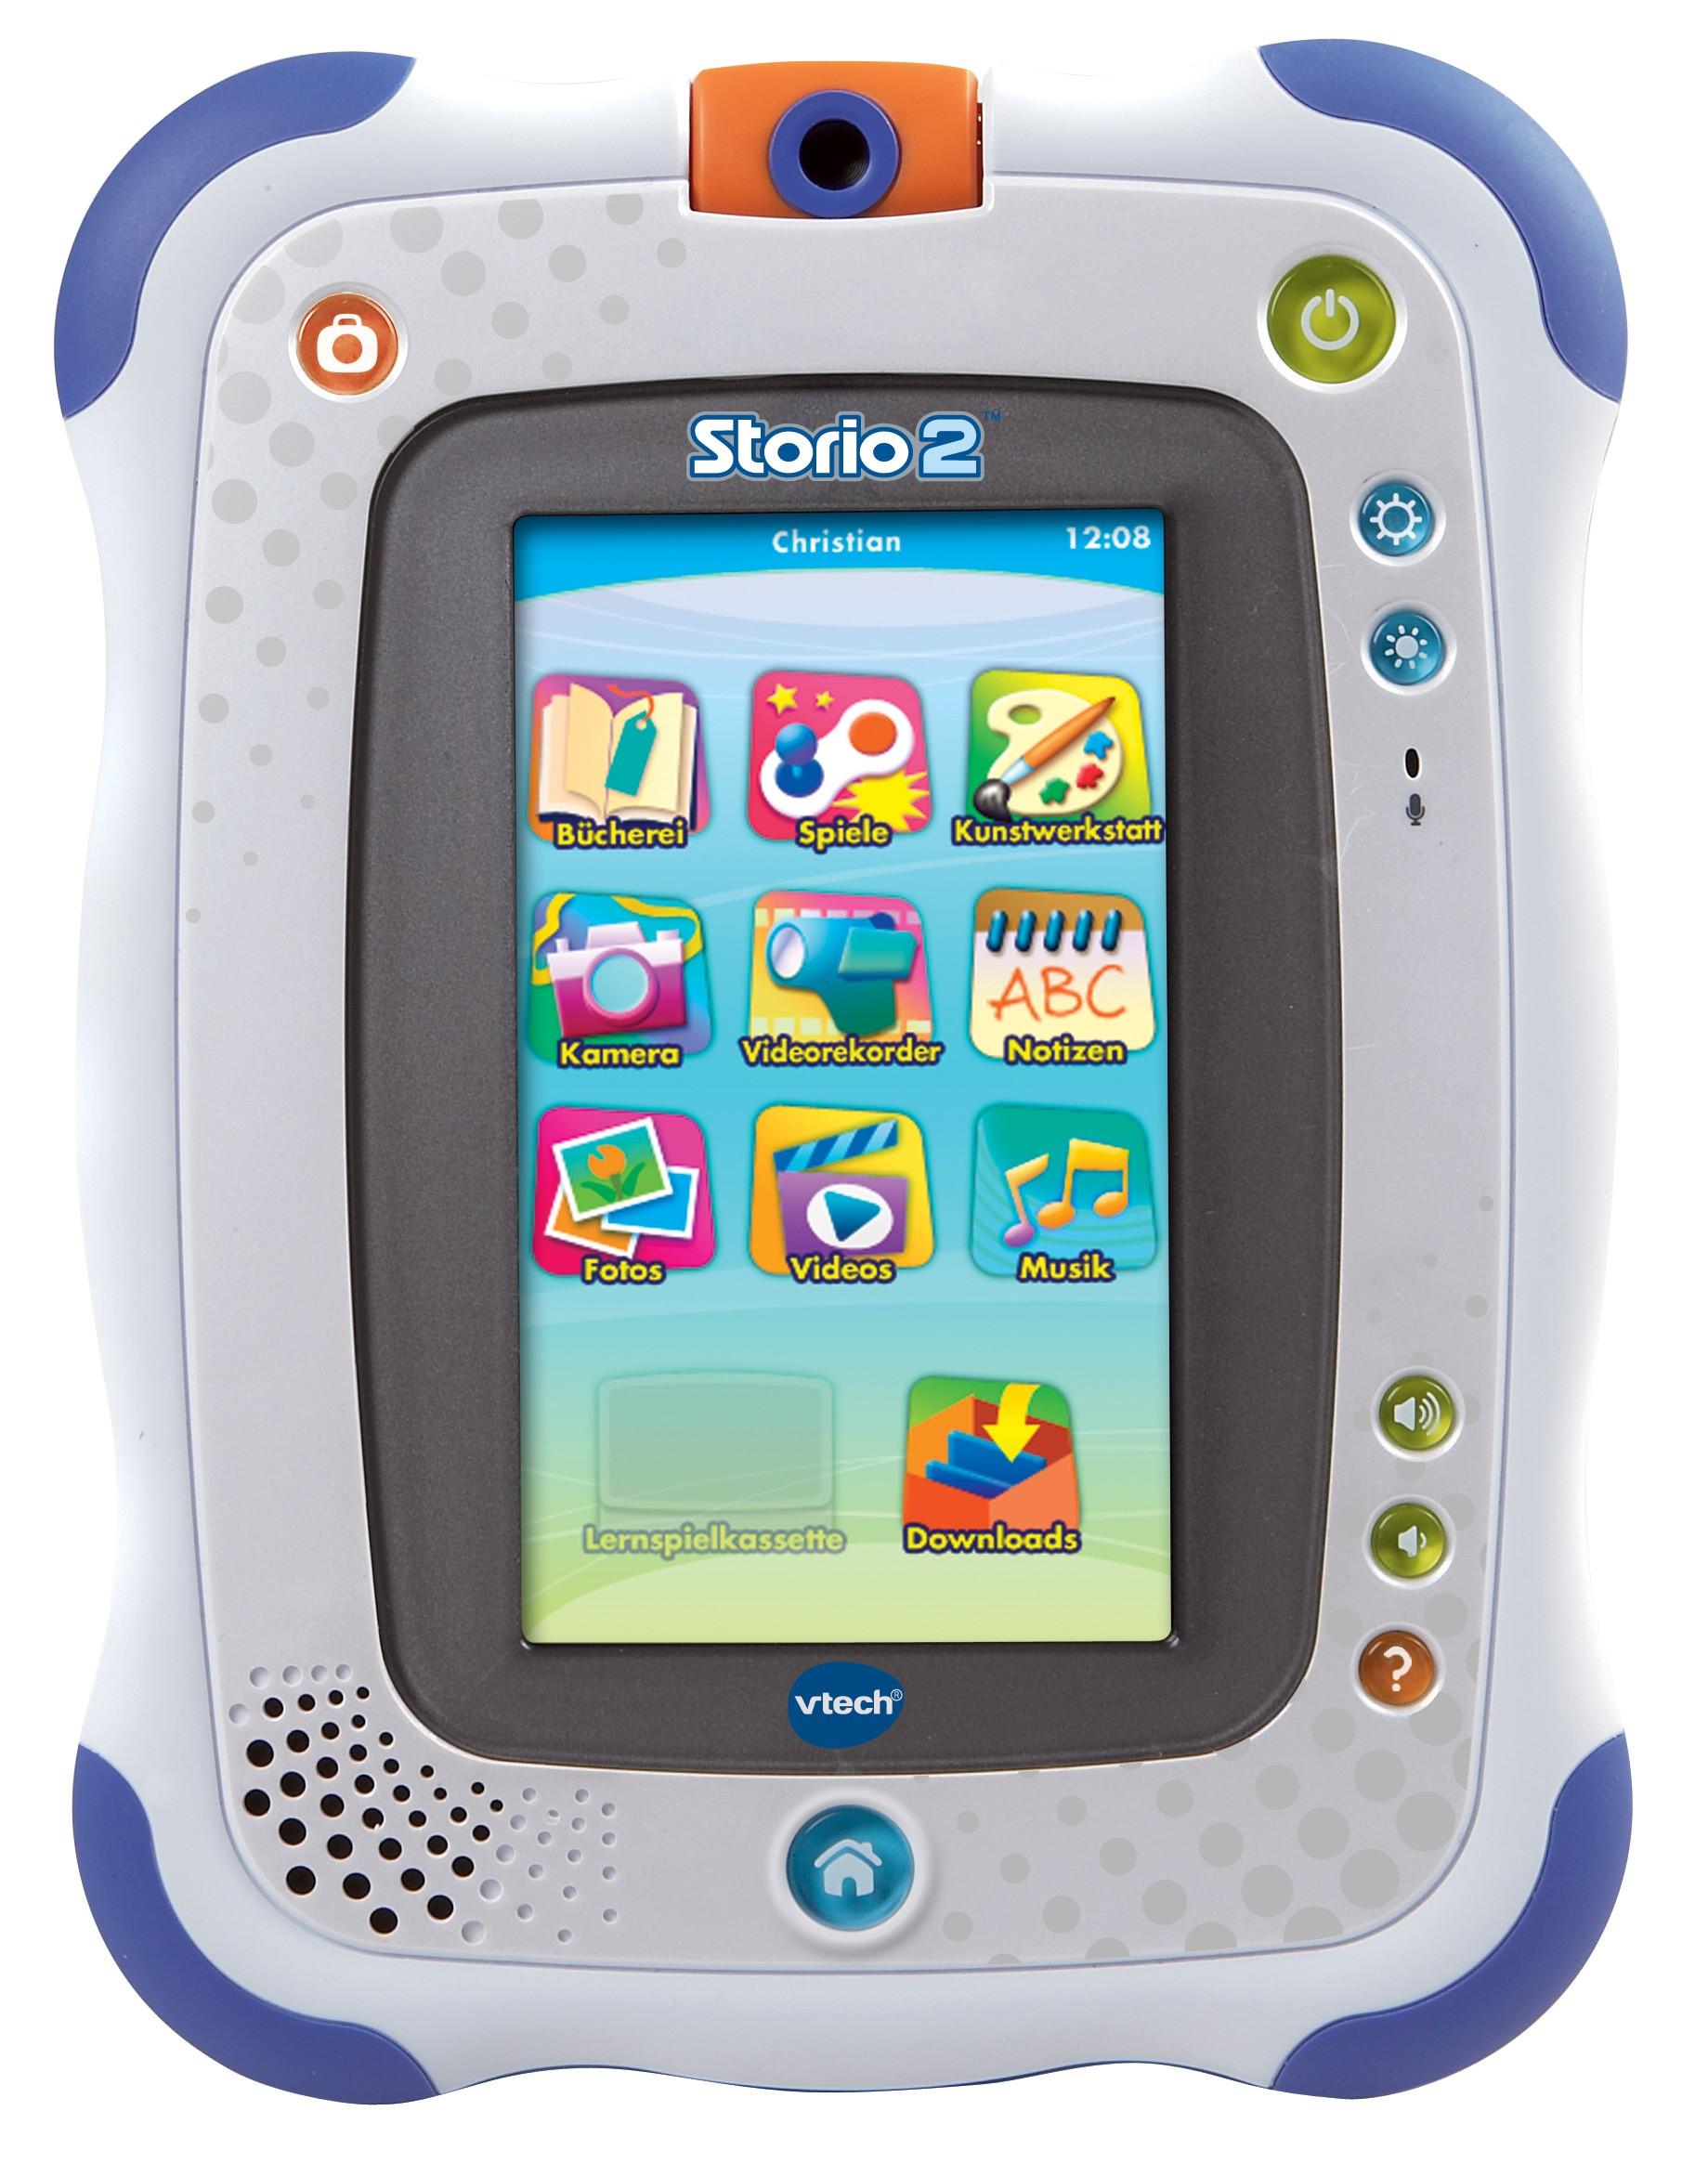 VTech Storio 2 blau Lern-Tablet für Kinder